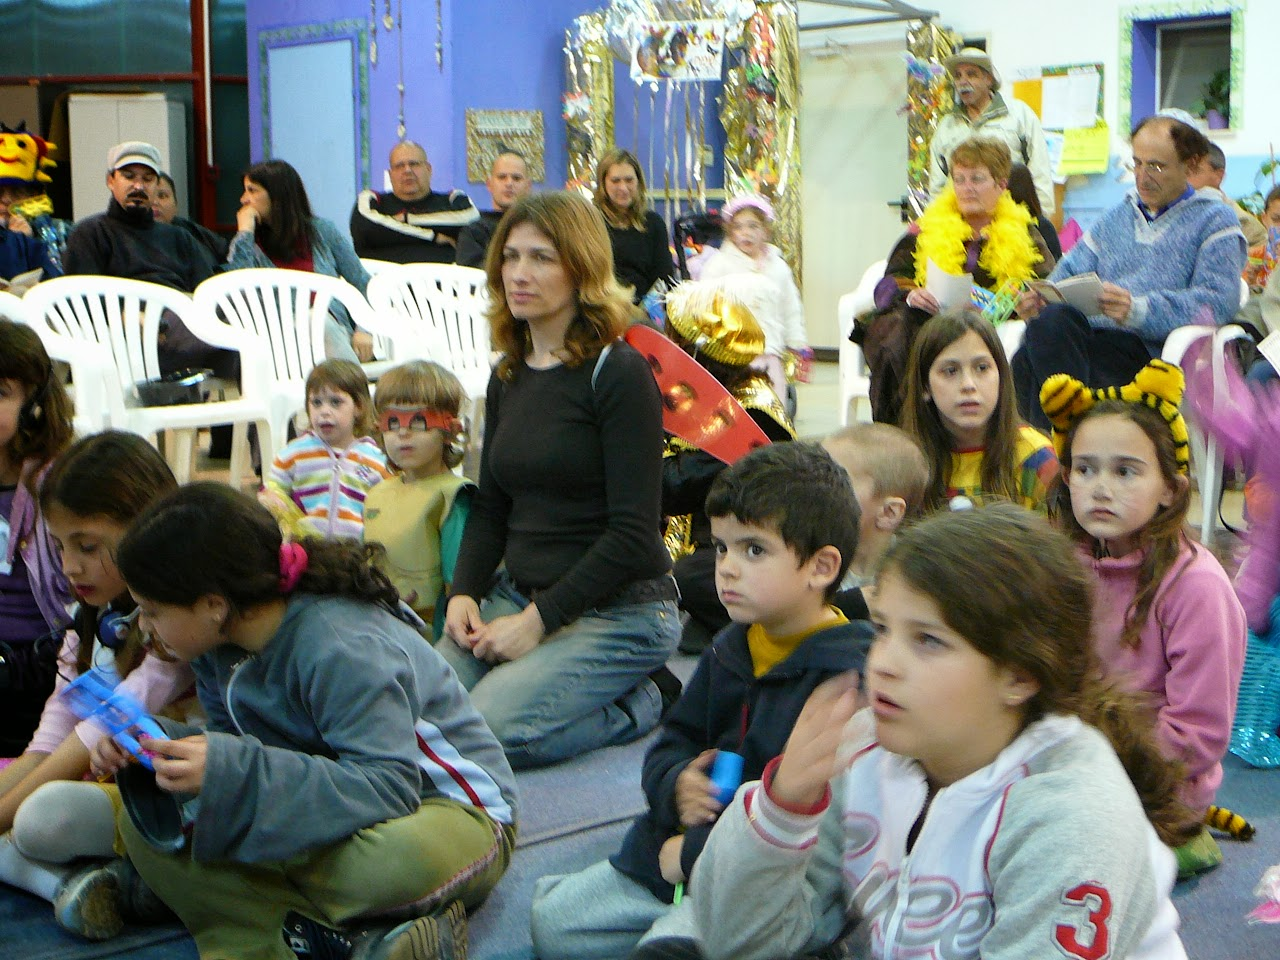 Purim 2007  - 2007-03-03 12.45.19.jpg